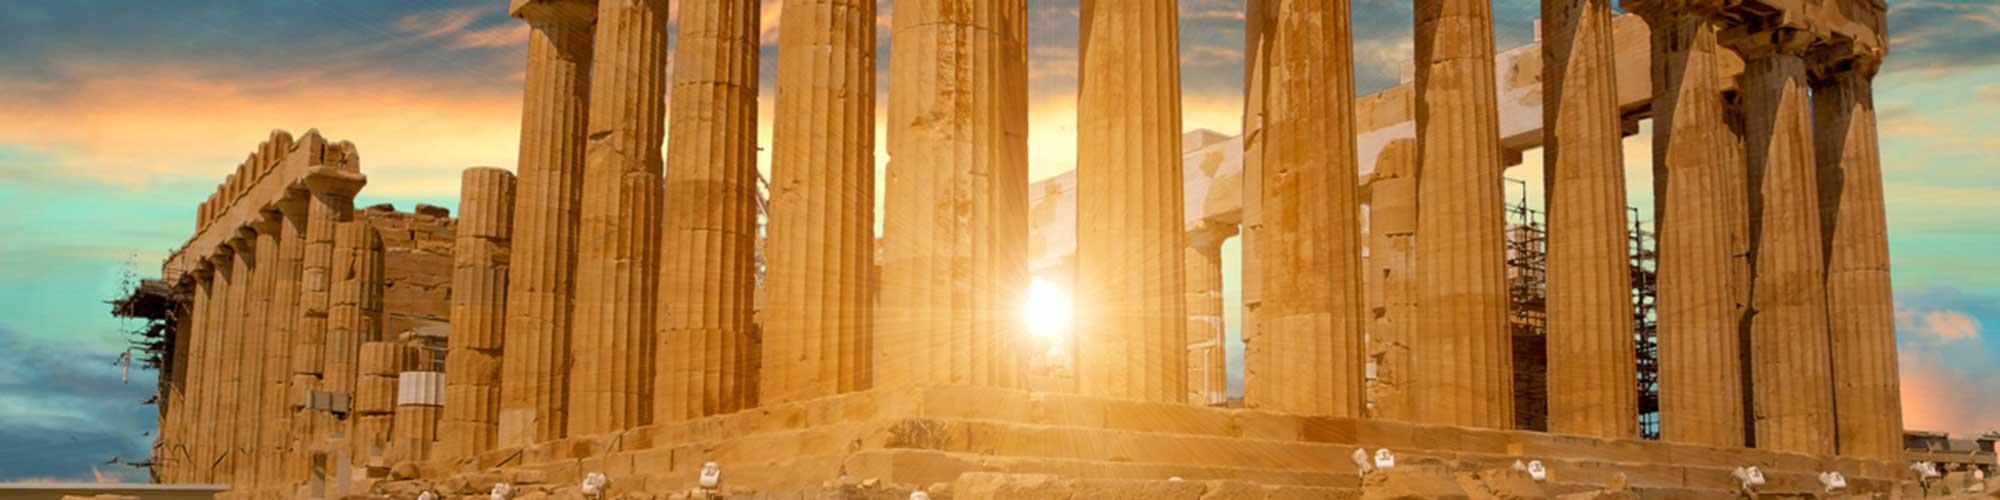 Sun rising behind the Parthenon at the Acropolis